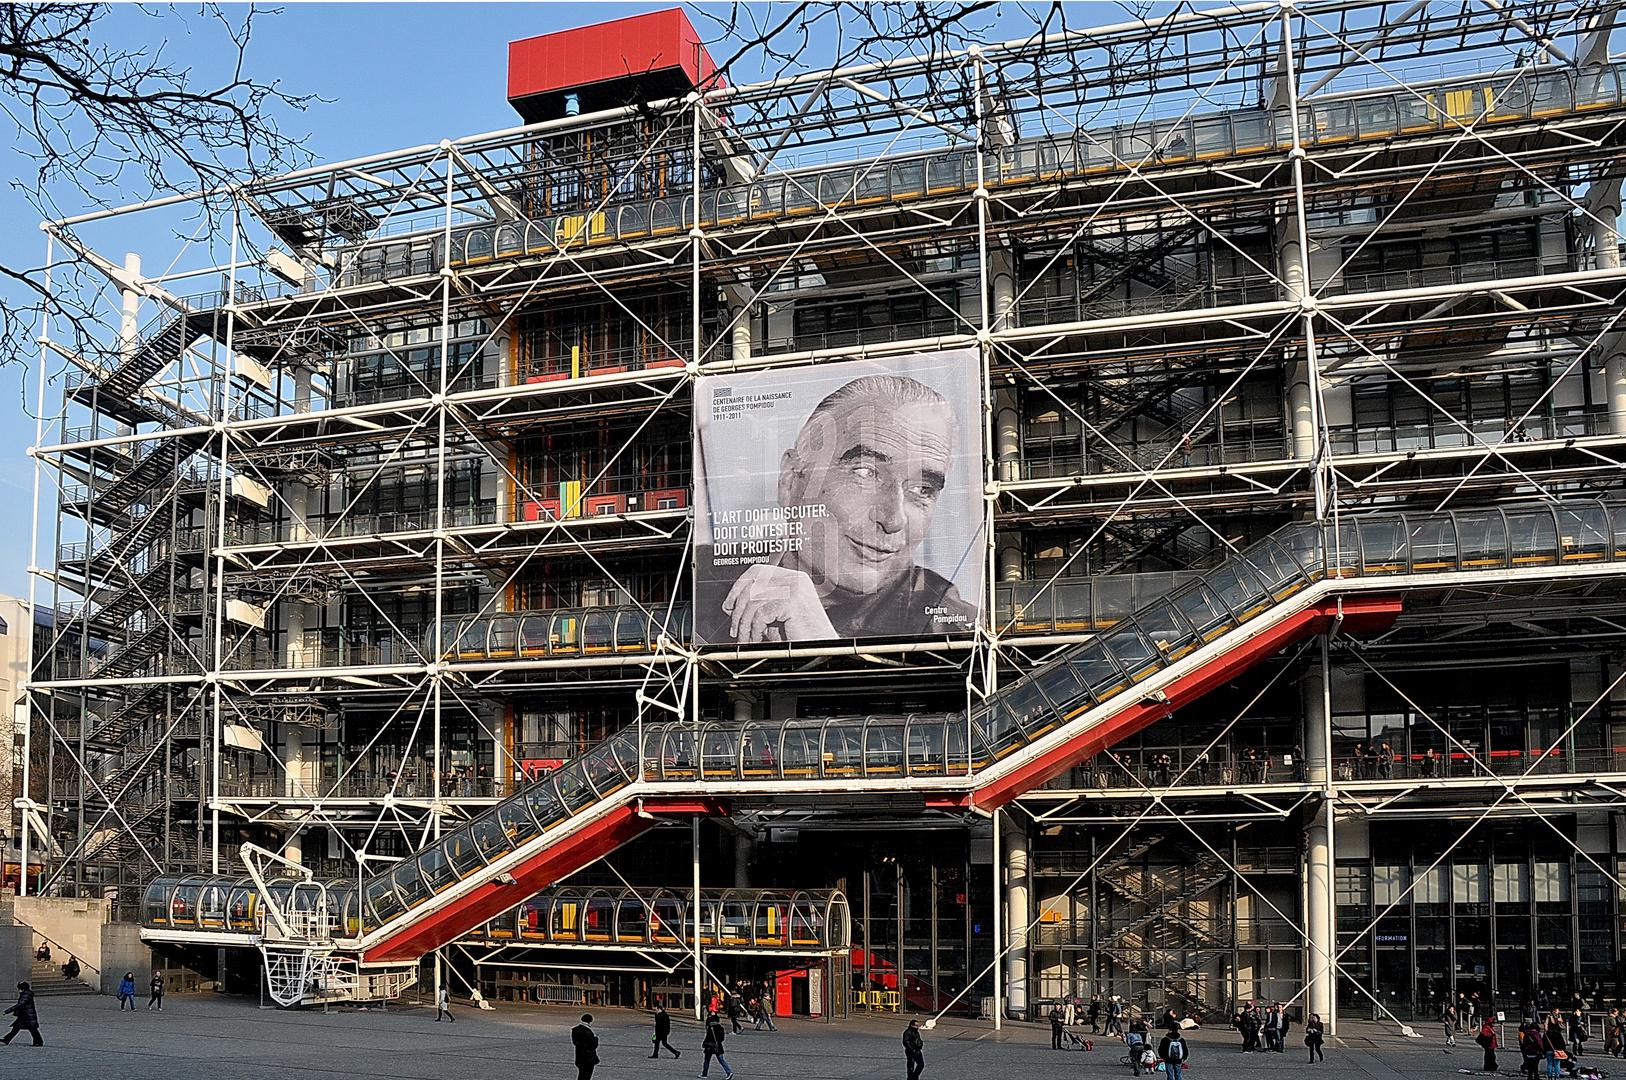 Paris Beaubourg Mars 2011 (1)